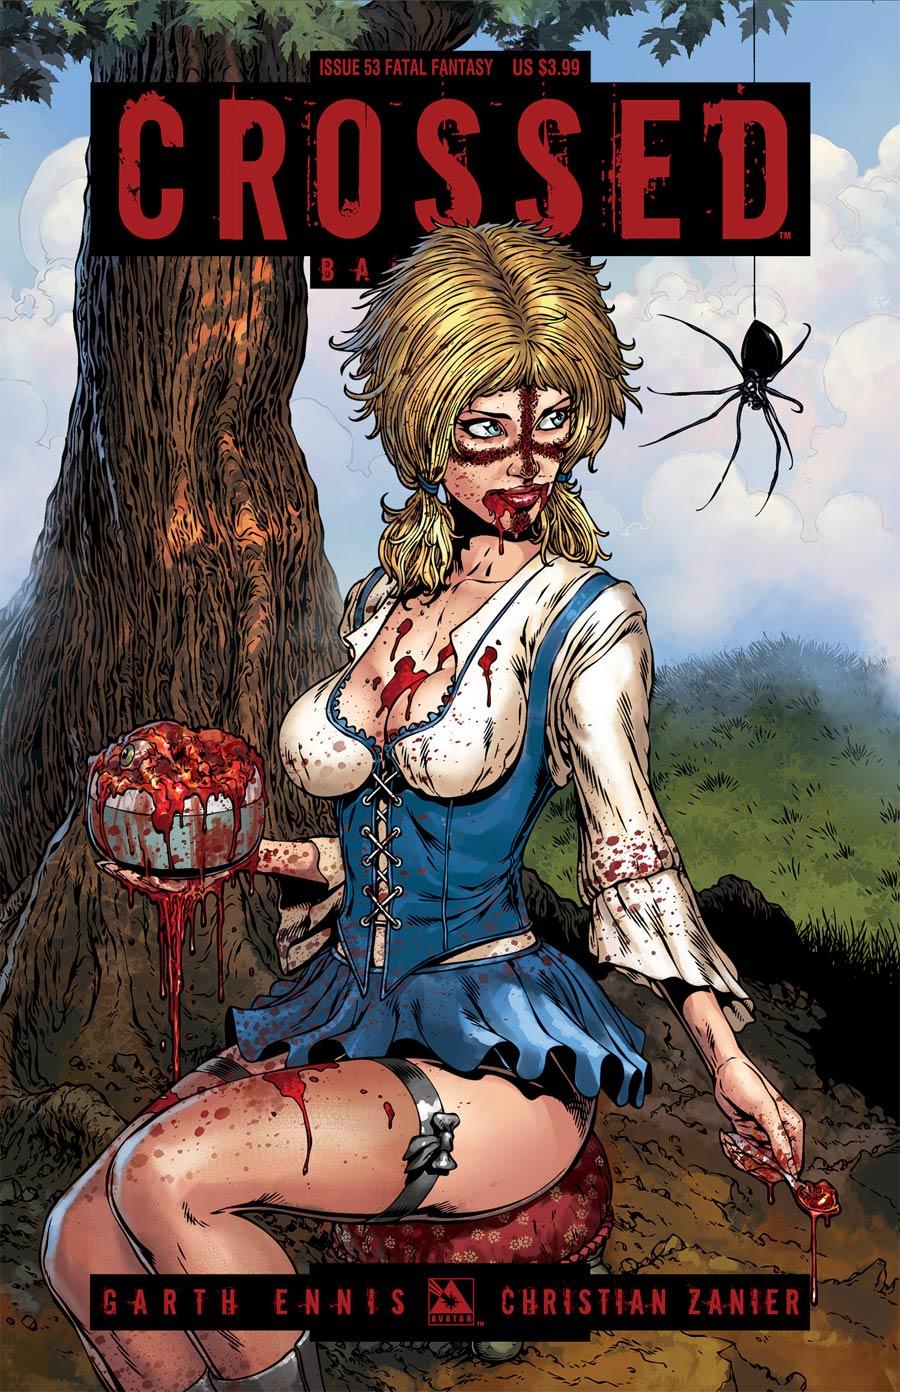 Crossed Badlands #53 Cover D Fatal Fantasy Cover